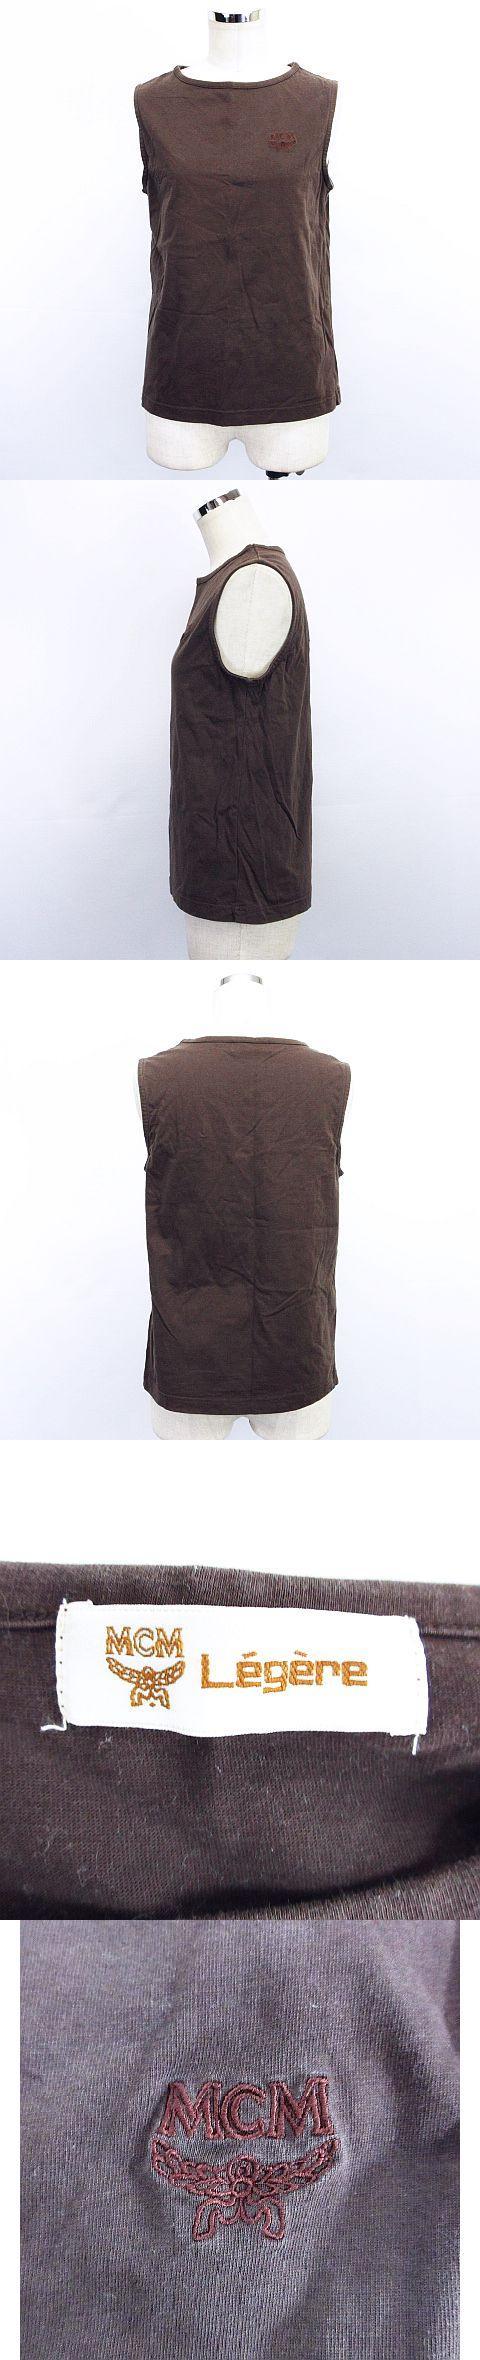 Tシャツ カットソー ノースリーブ ラウンドネック ロゴ 刺繍 LL ブラウン ※EAN